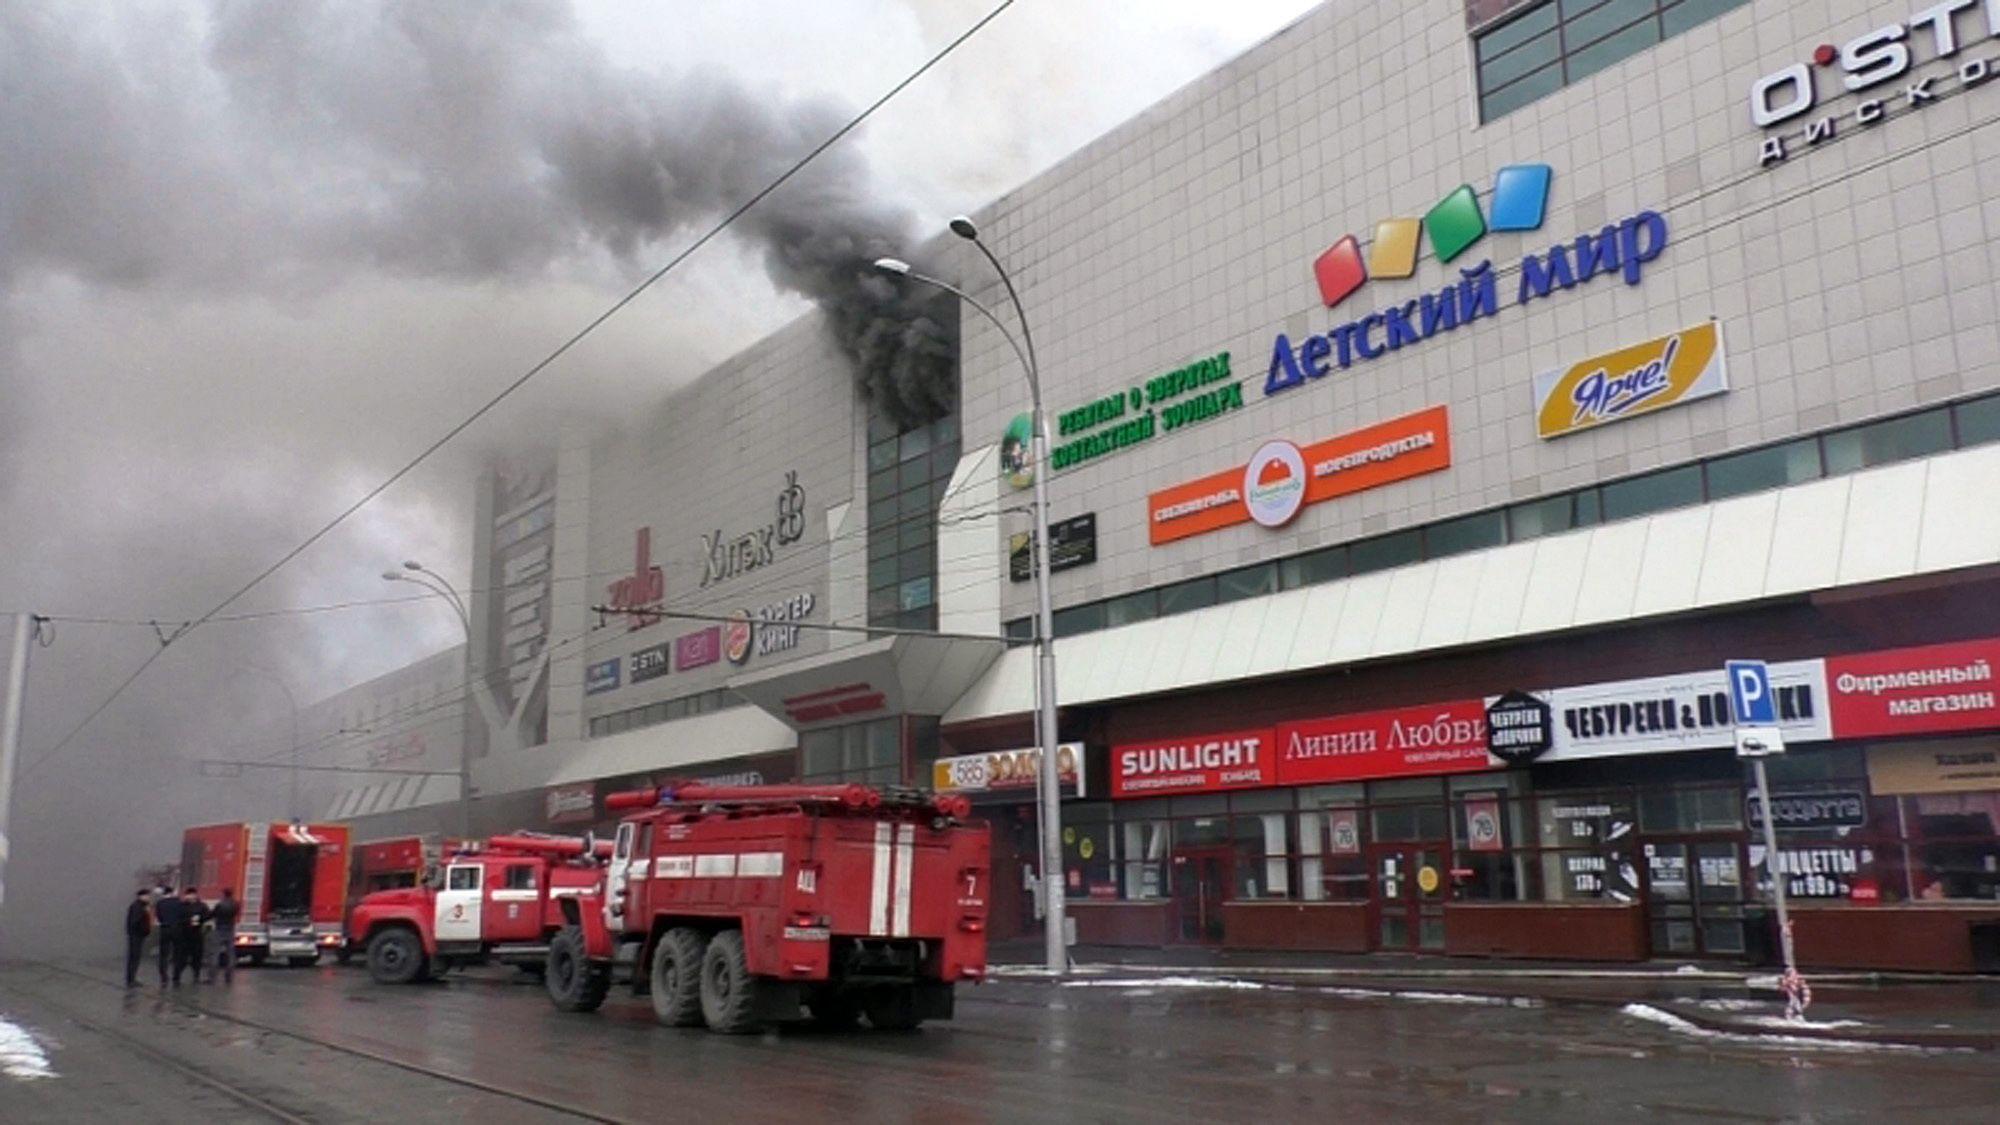 Fuego en centro comercial en Rusia